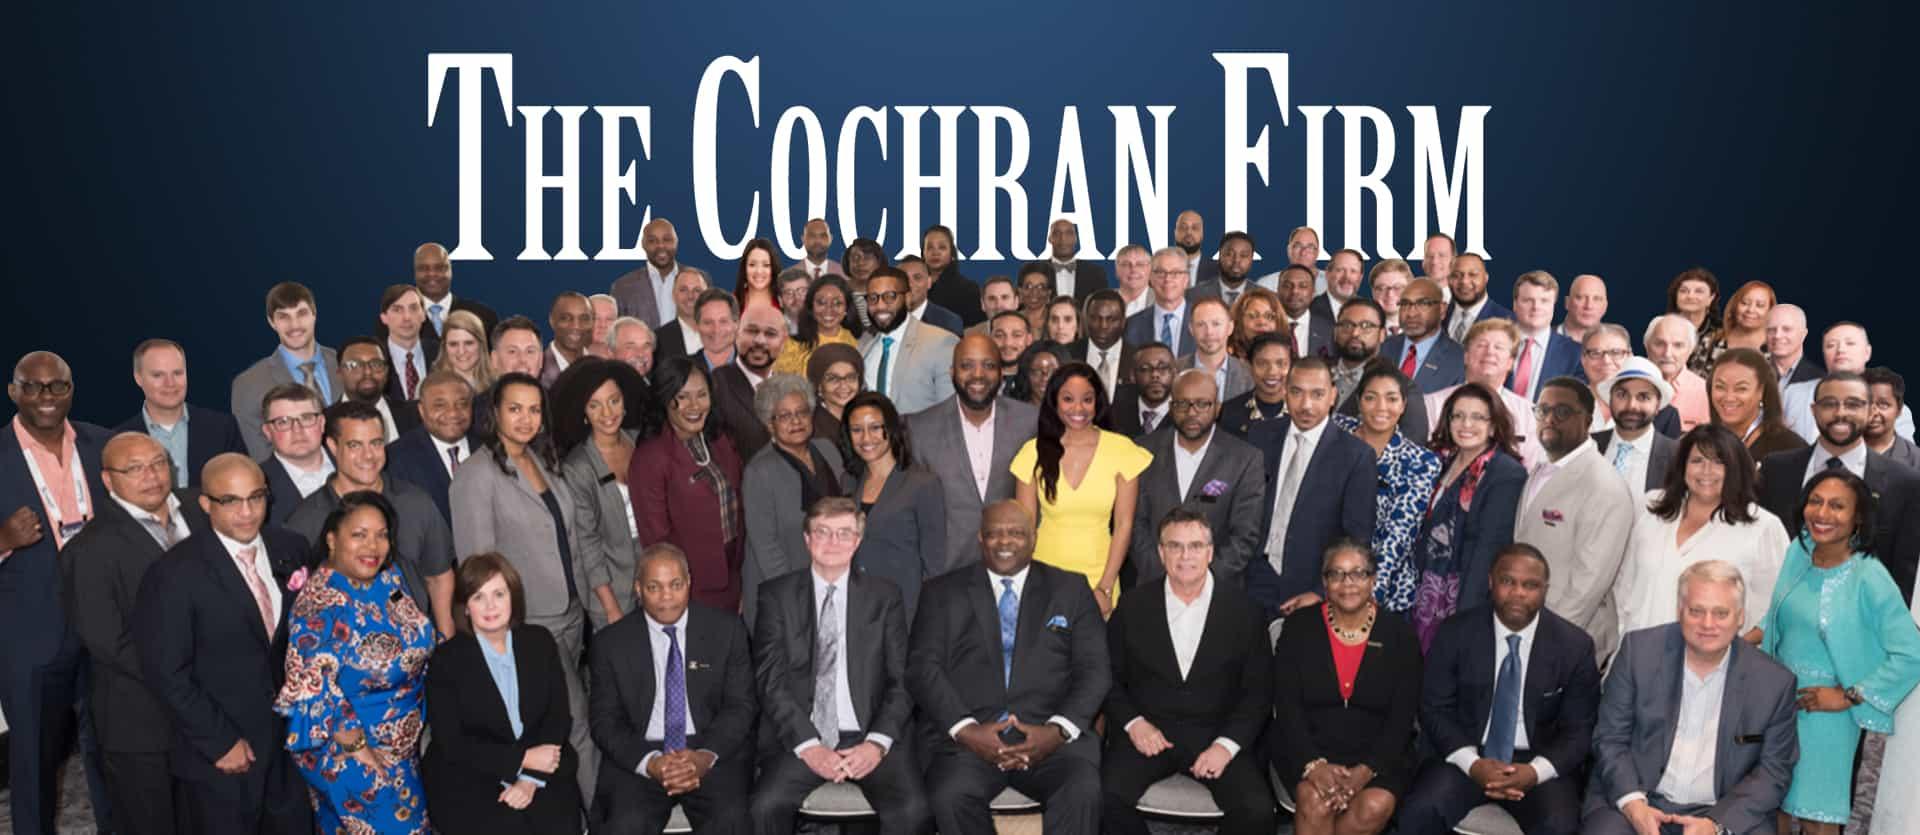 img-Cochran Team